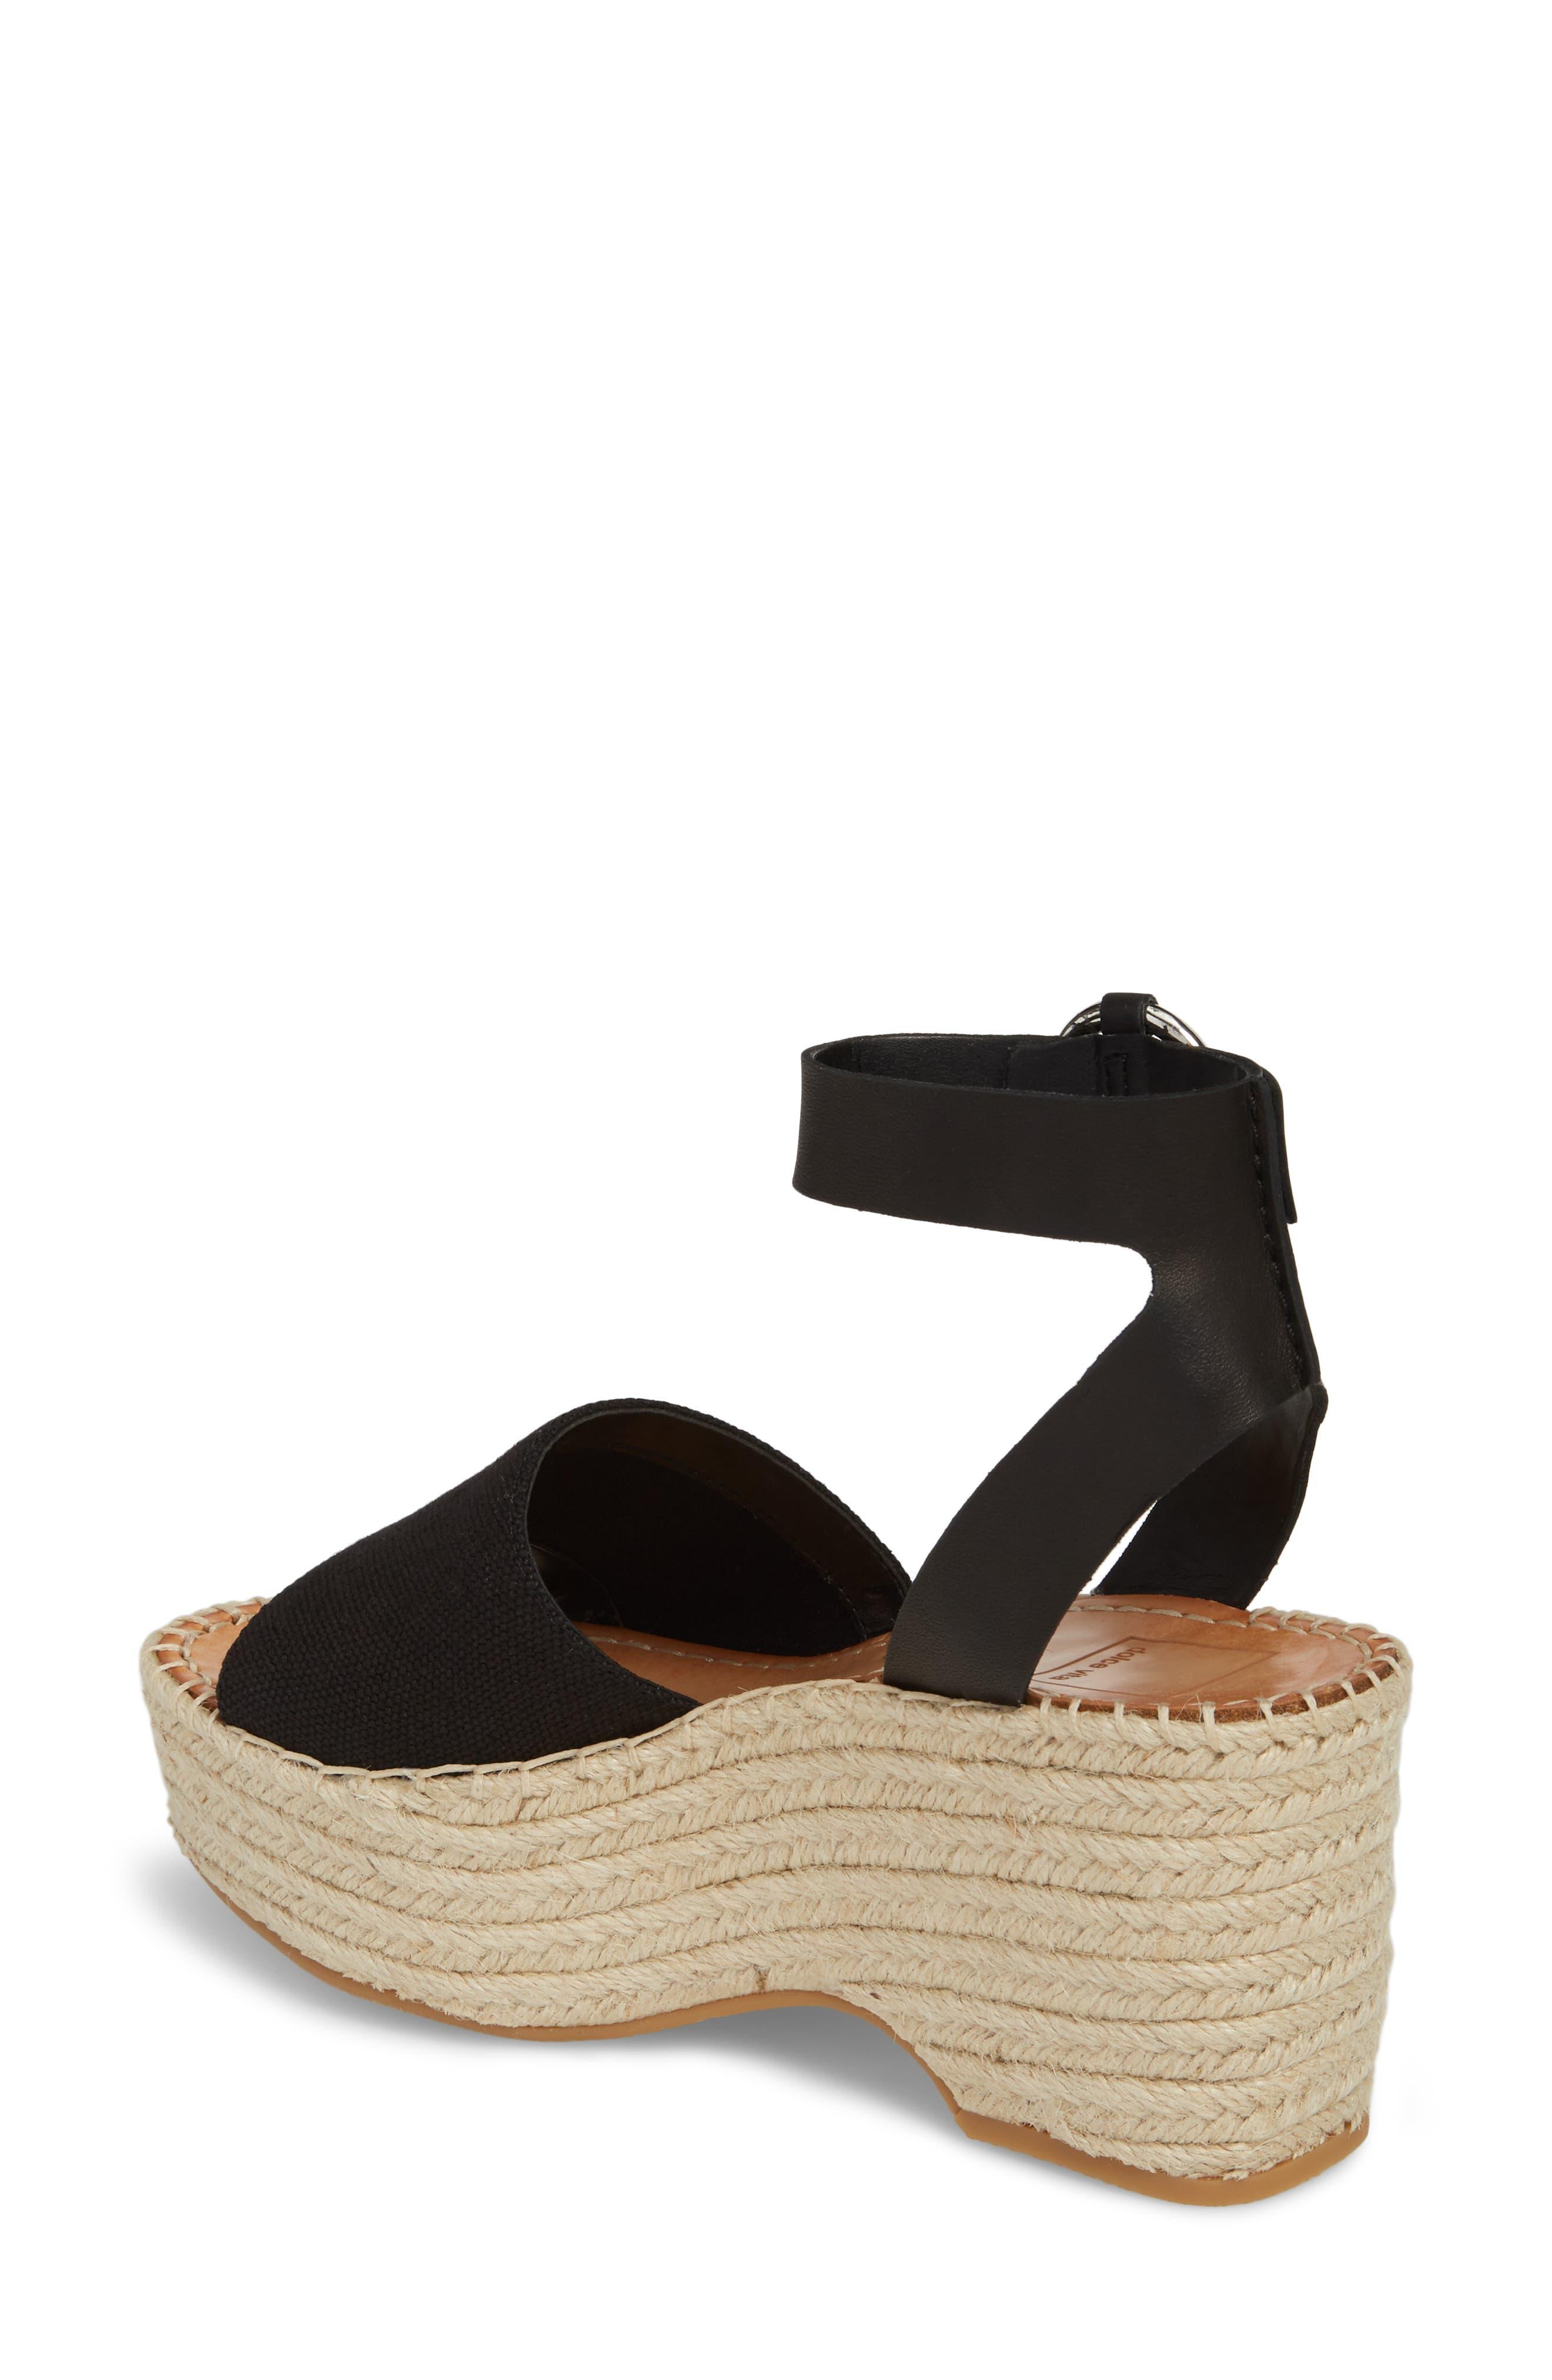 DOLCE VITA, Lesly Espadrille Platform Sandal, Alternate thumbnail 2, color, 001